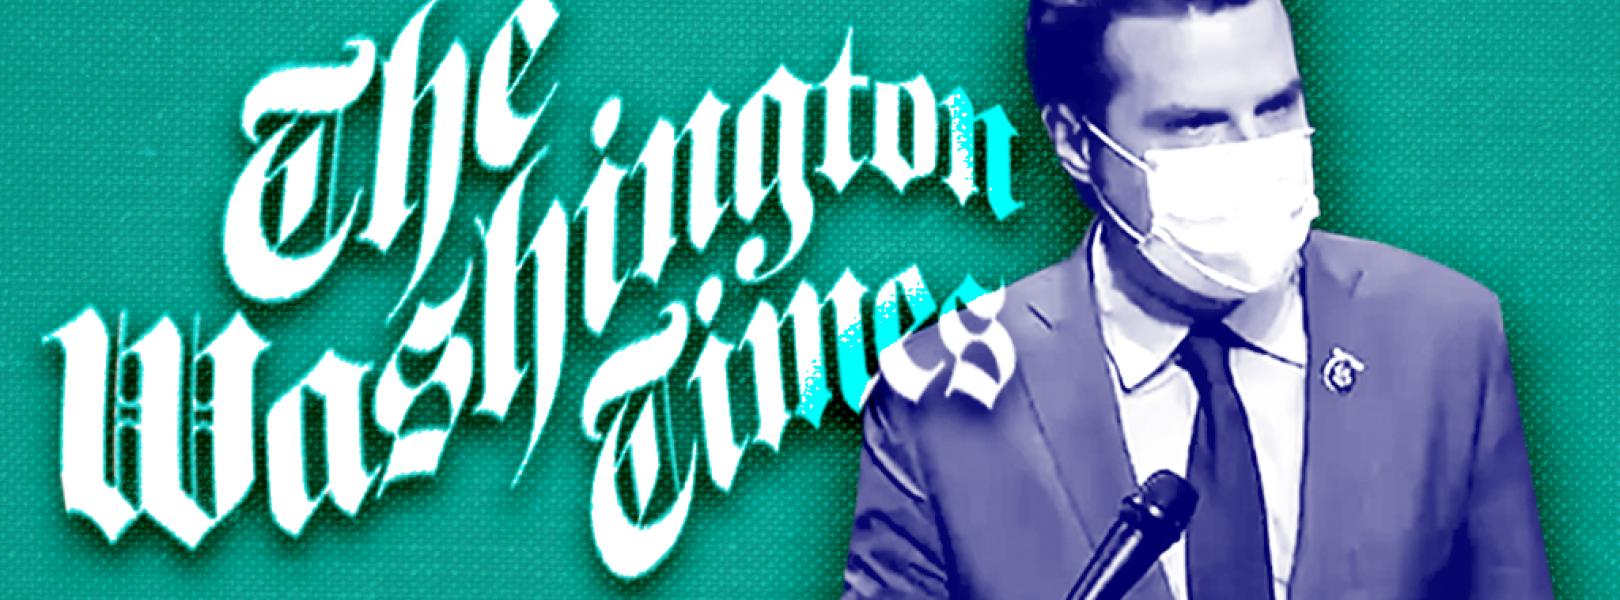 Matt Gaetz Washington Times